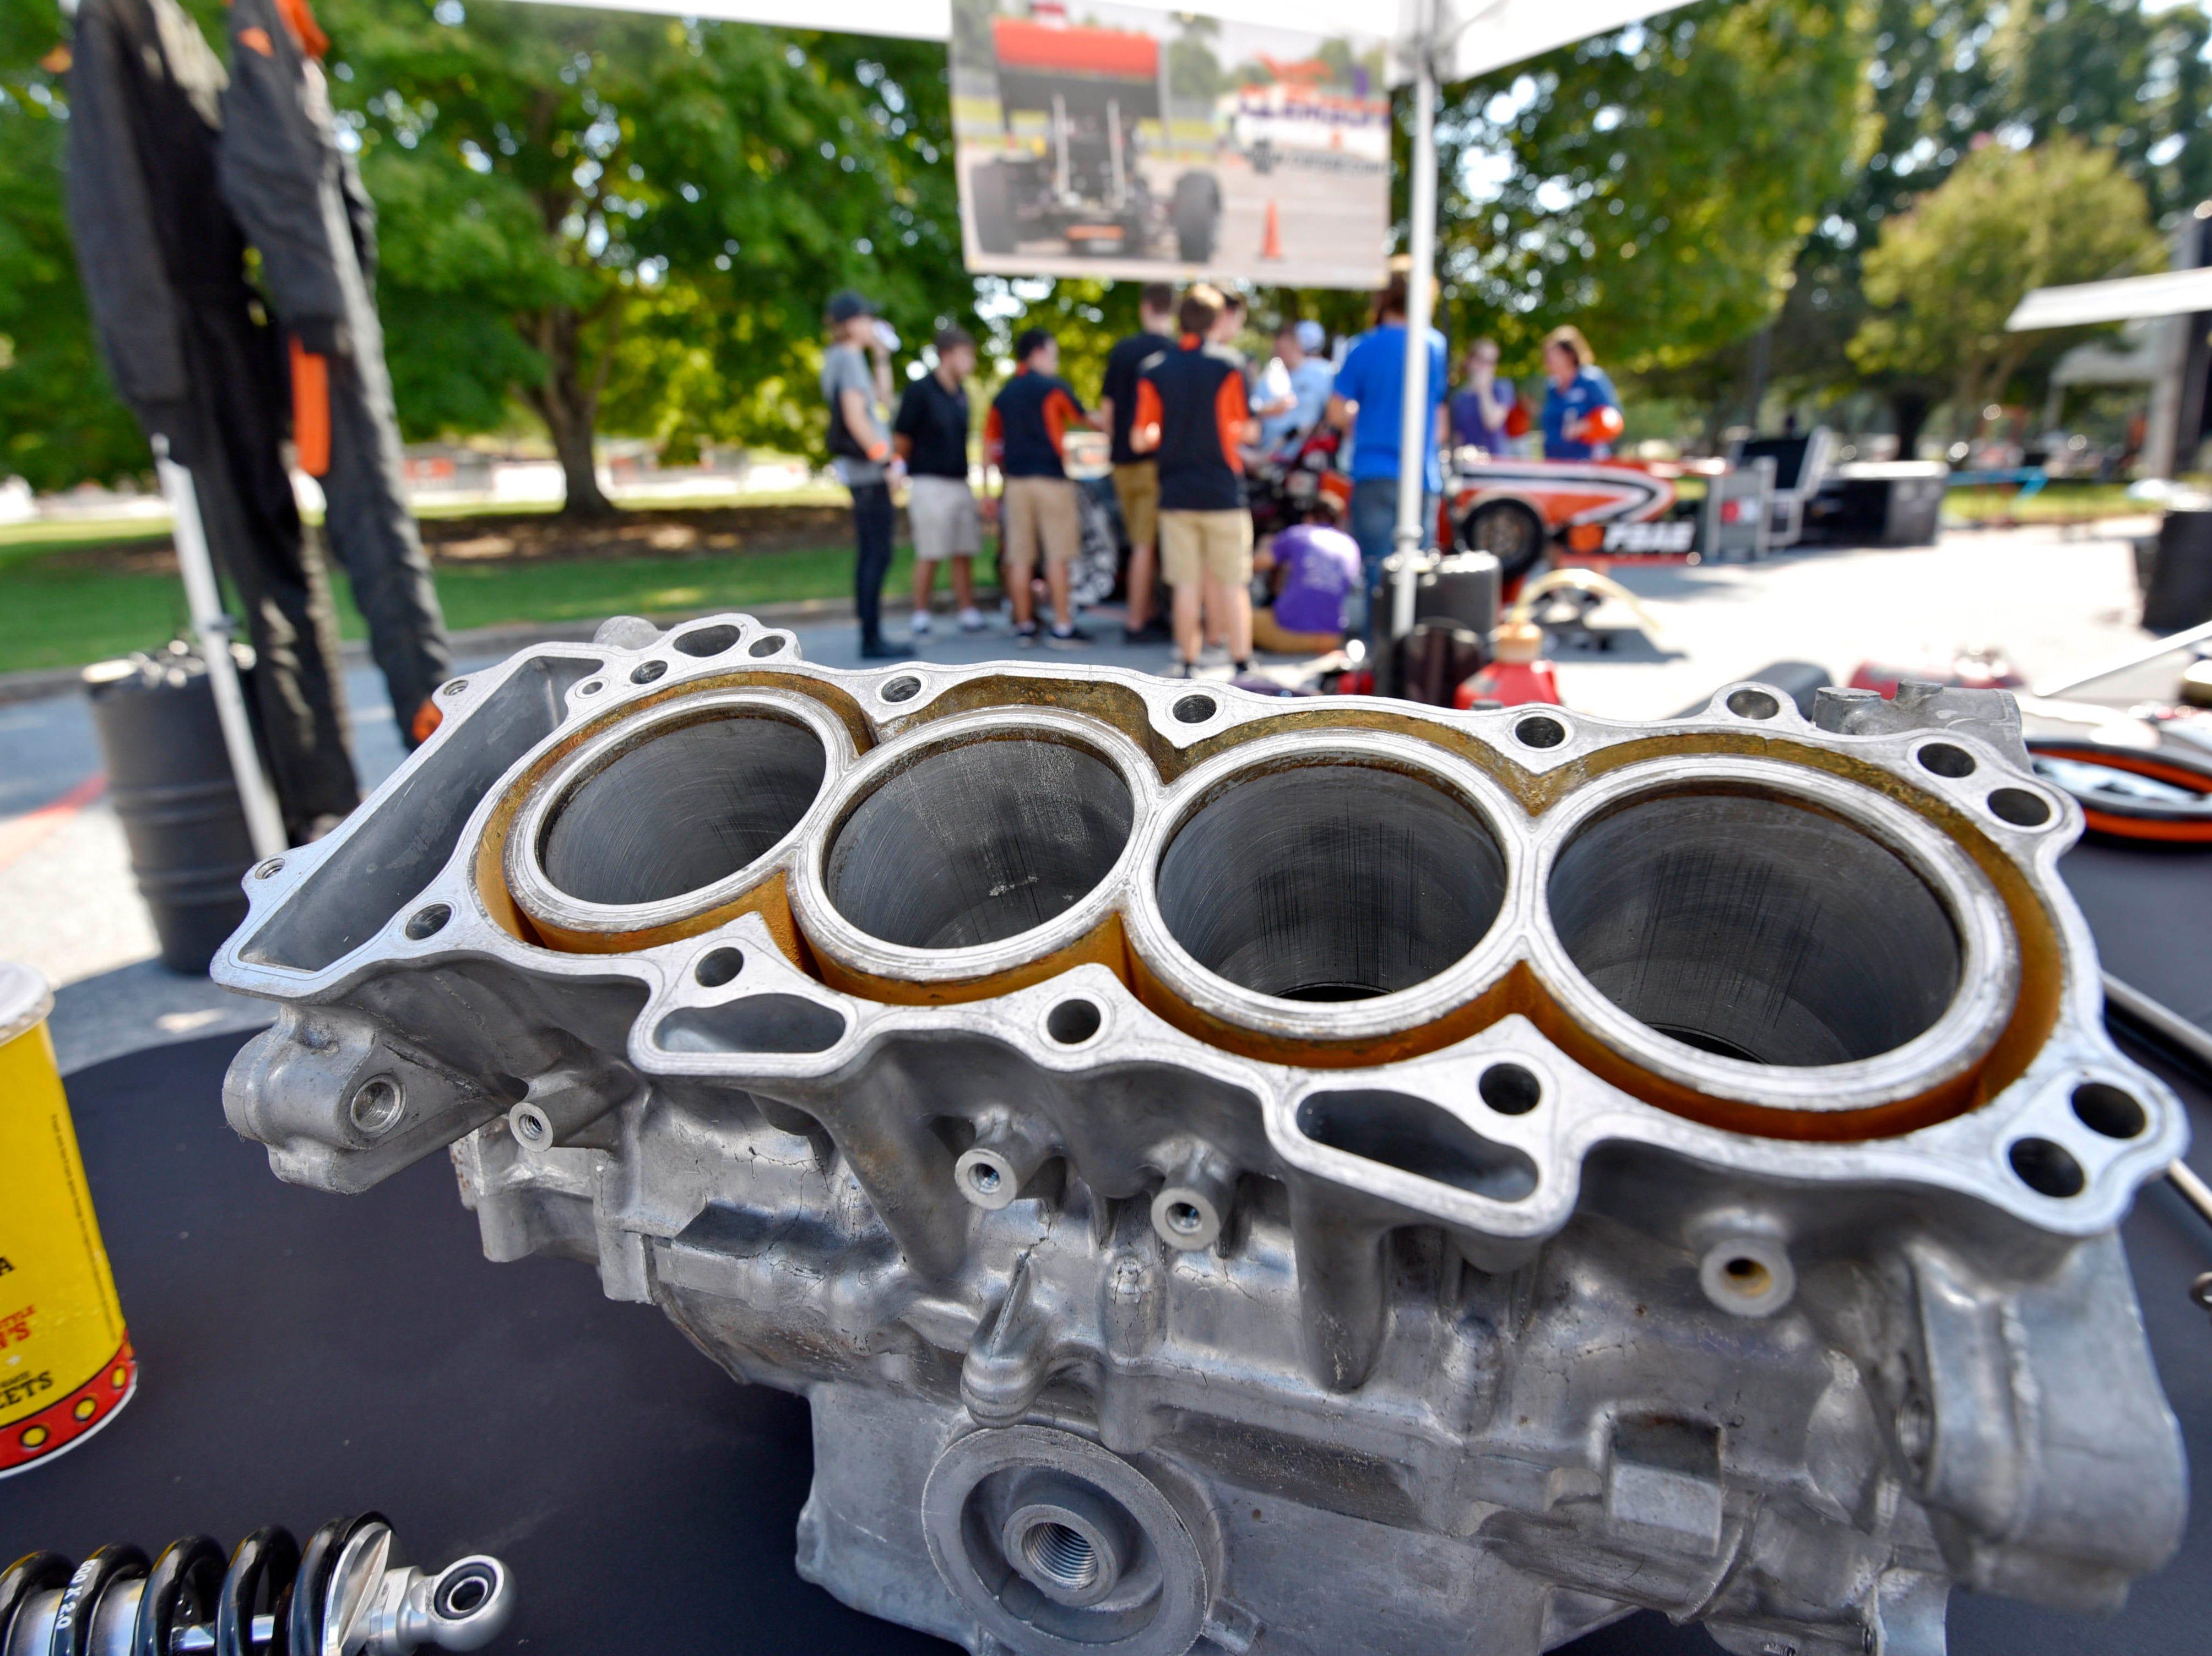 CU-ICAR unveiled the new Deep Orange 9 rally car Saturday, October 6,  2018.